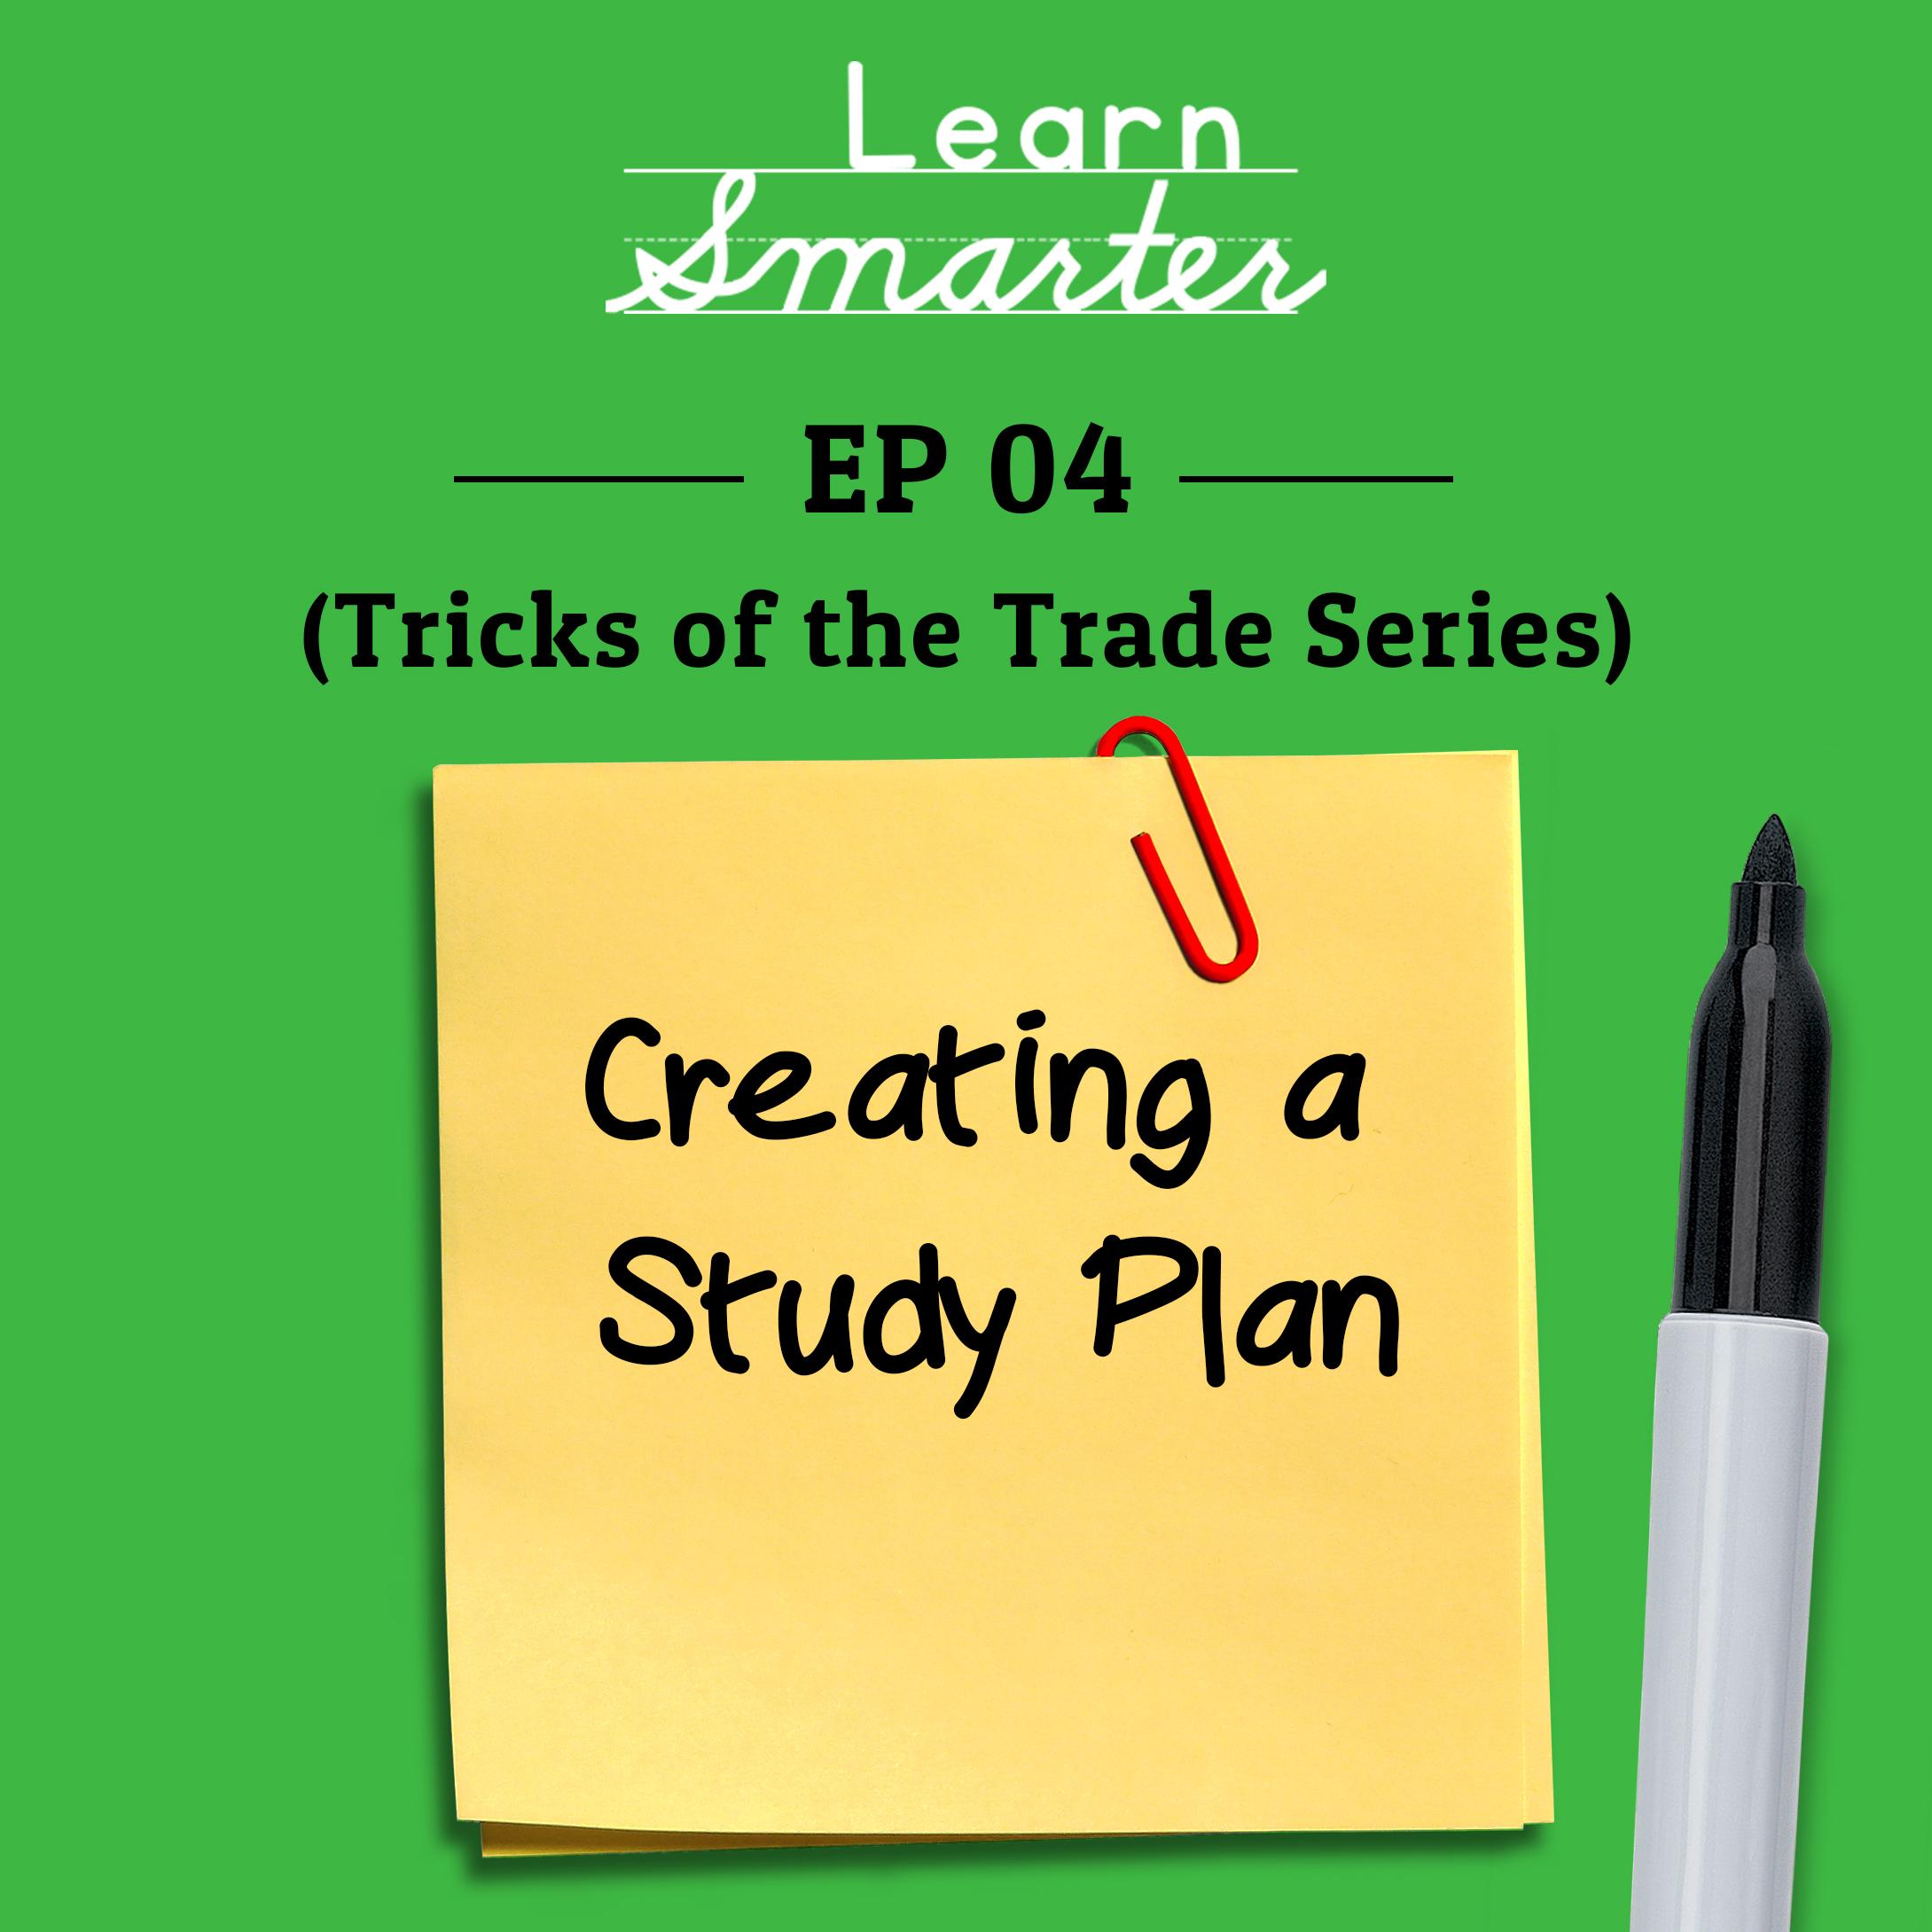 Ep 04: Creating a Study Plan